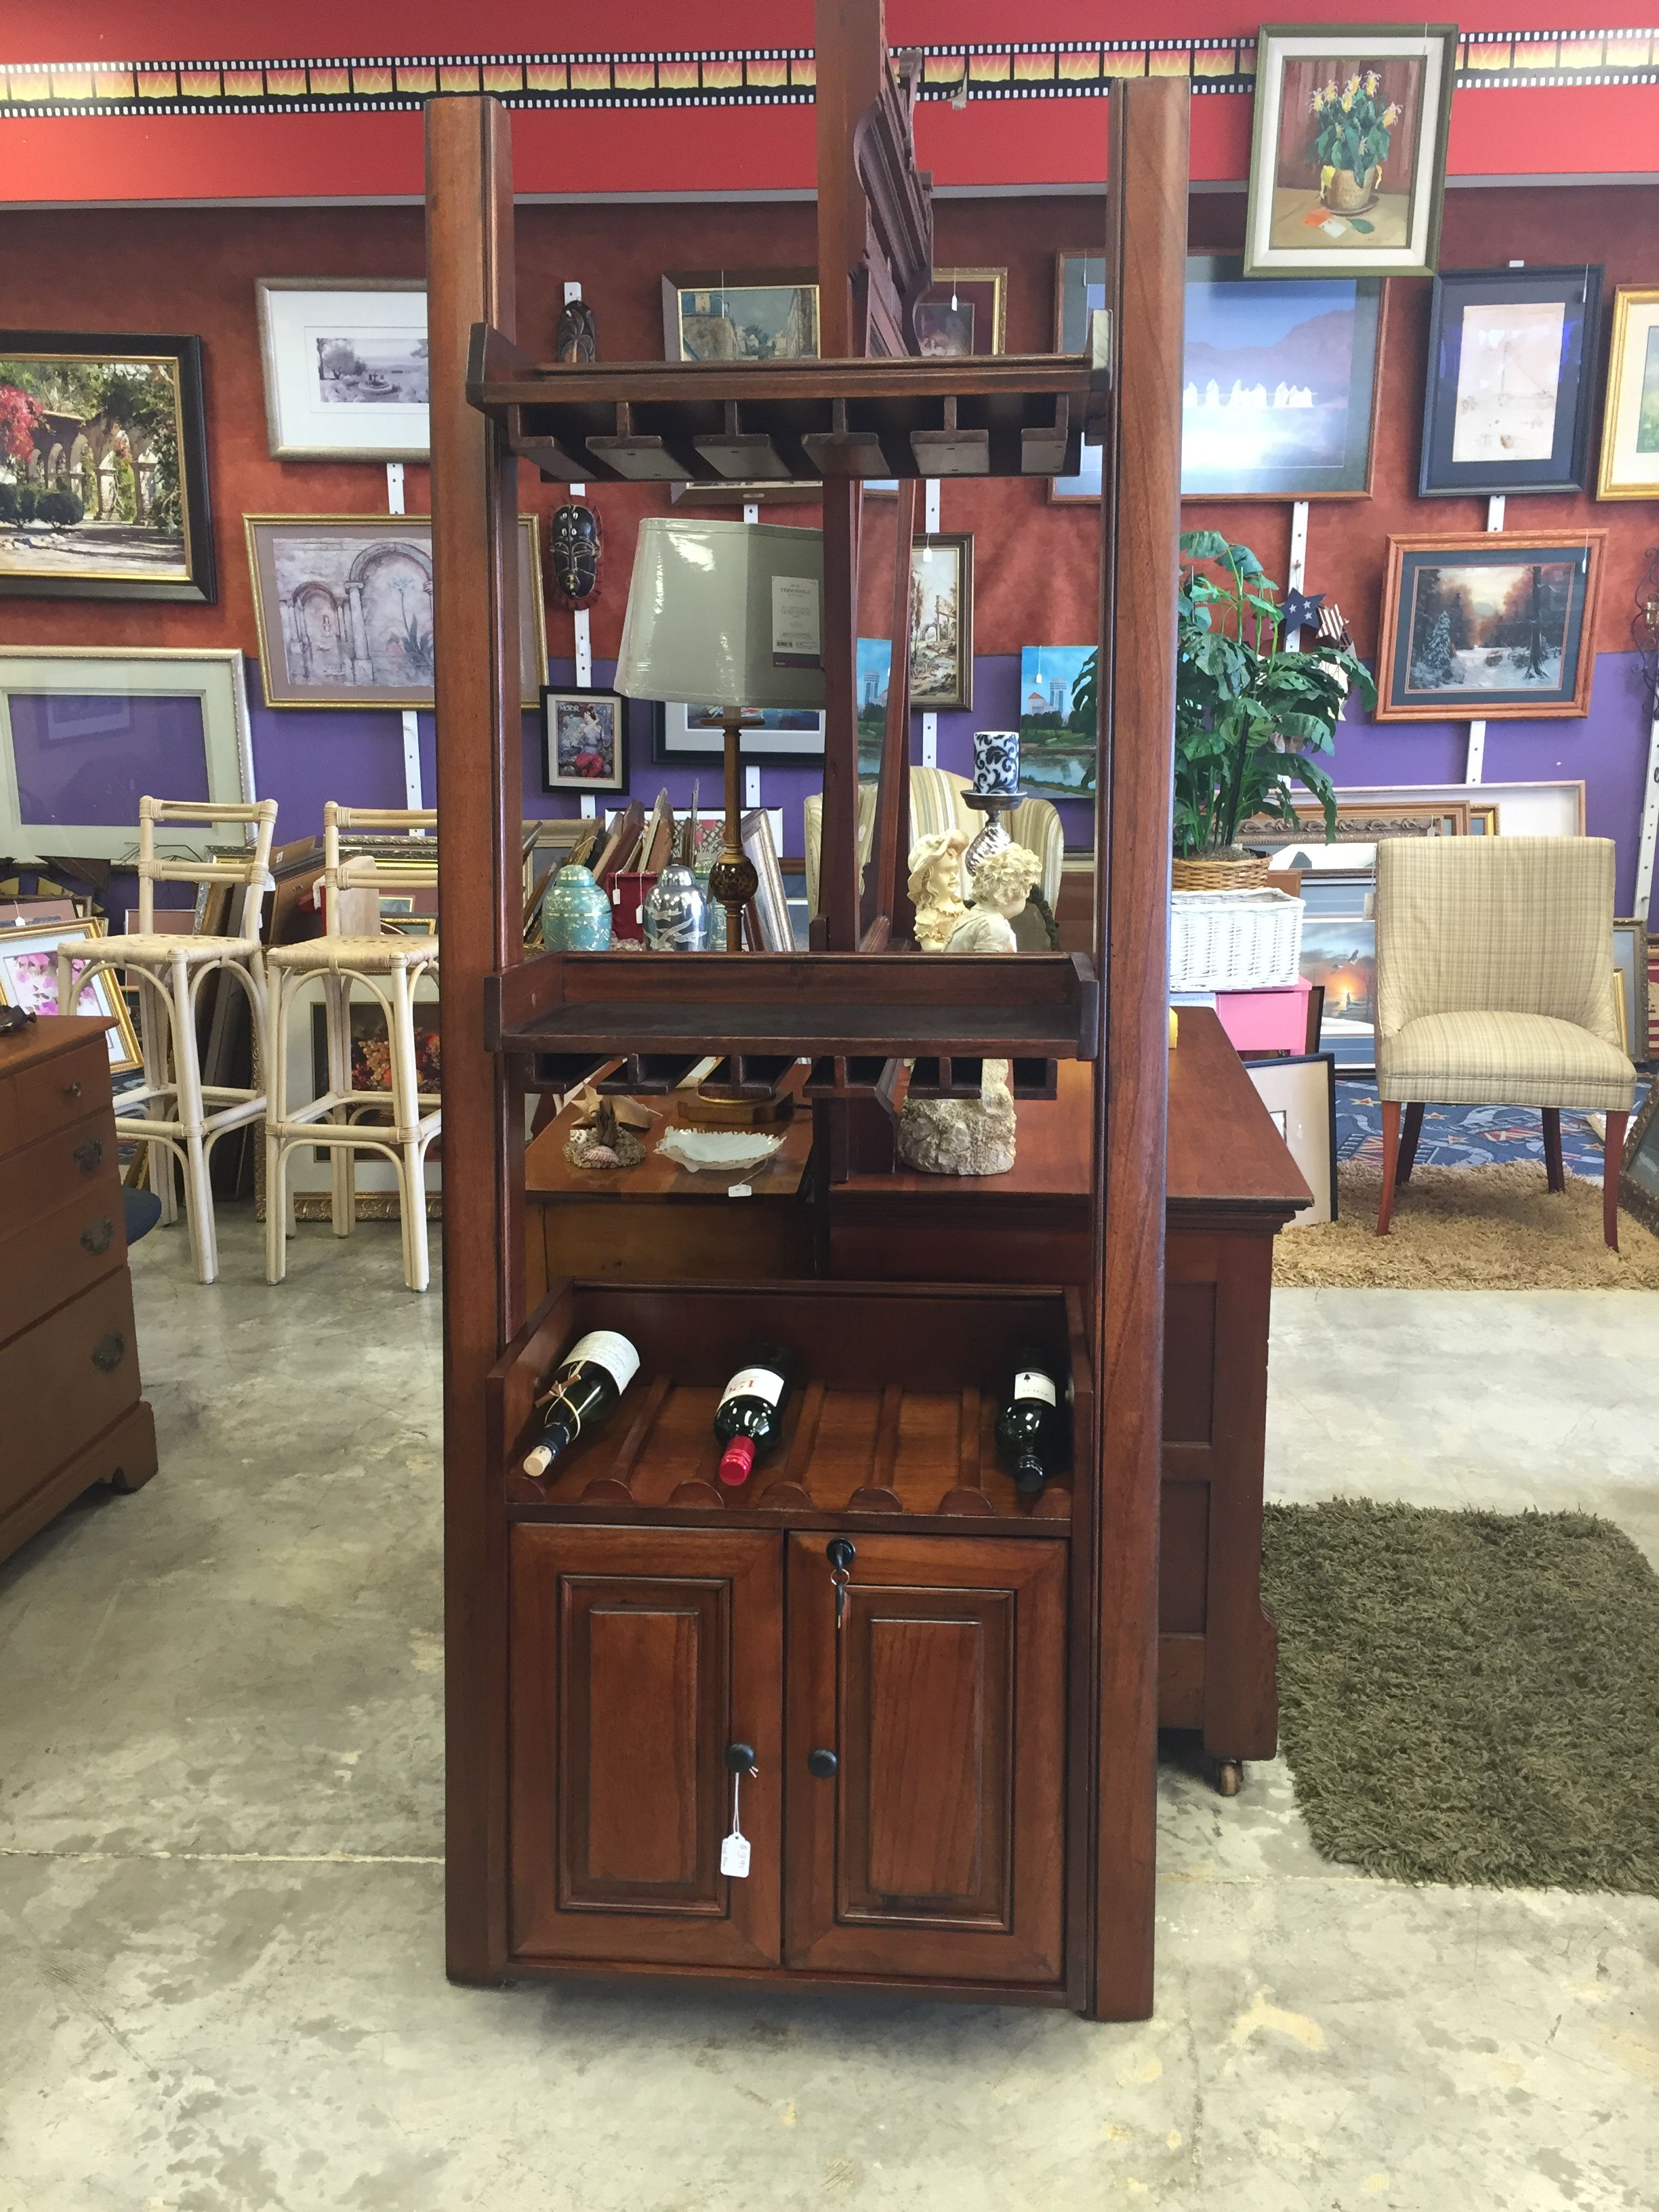 MK Consignment Store Wichita, Kansas | Furniture ...